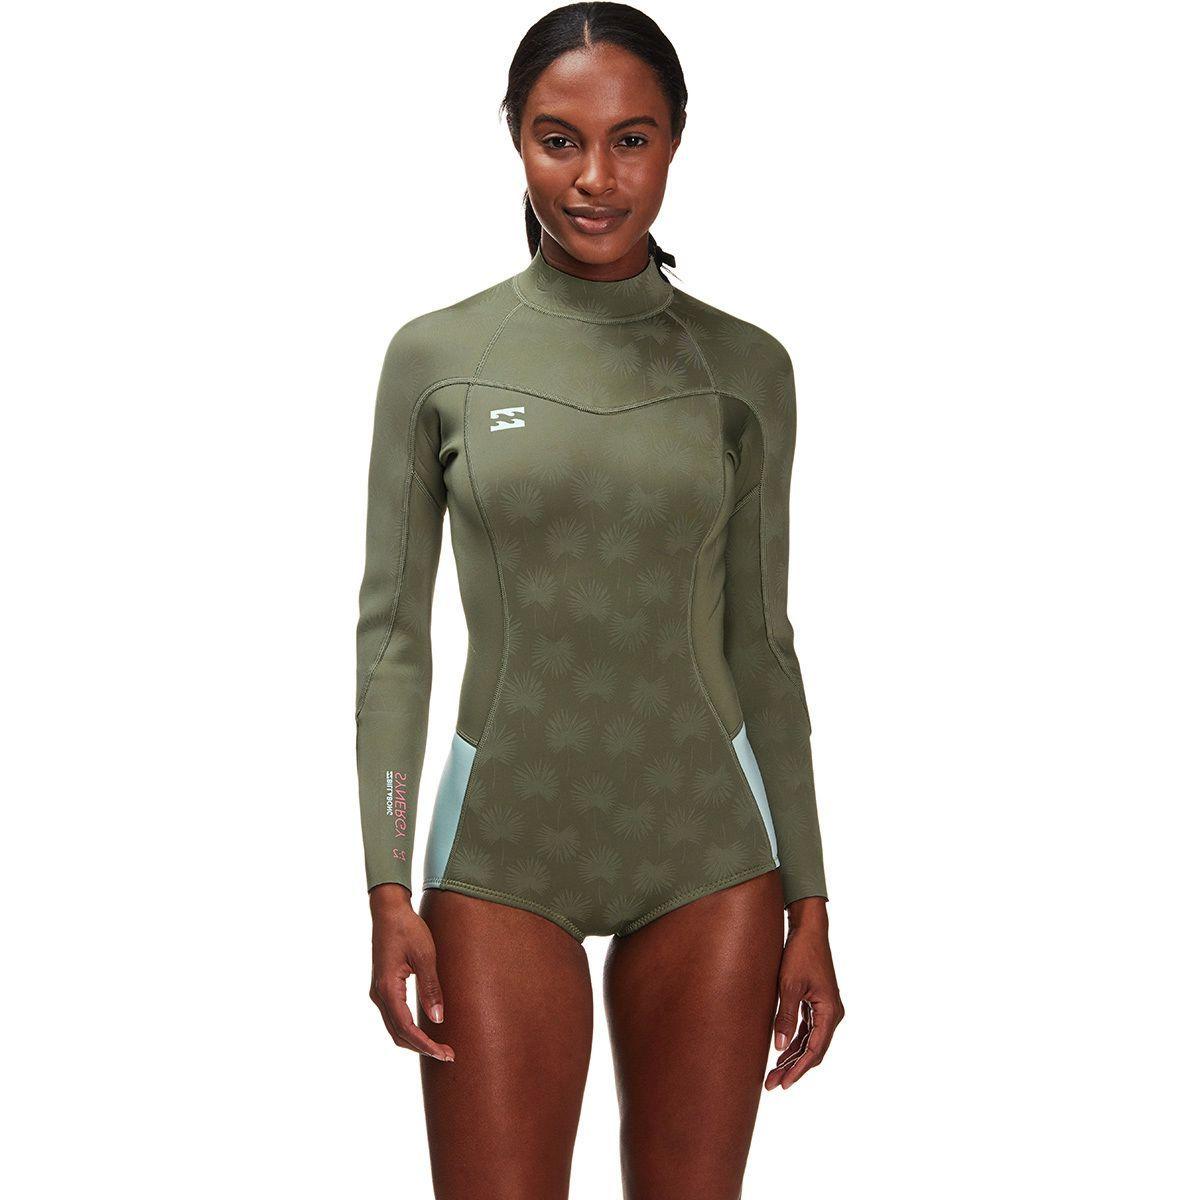 Billabong 2mm Synergy Back Zip Flatlock Spring Suit - Women's